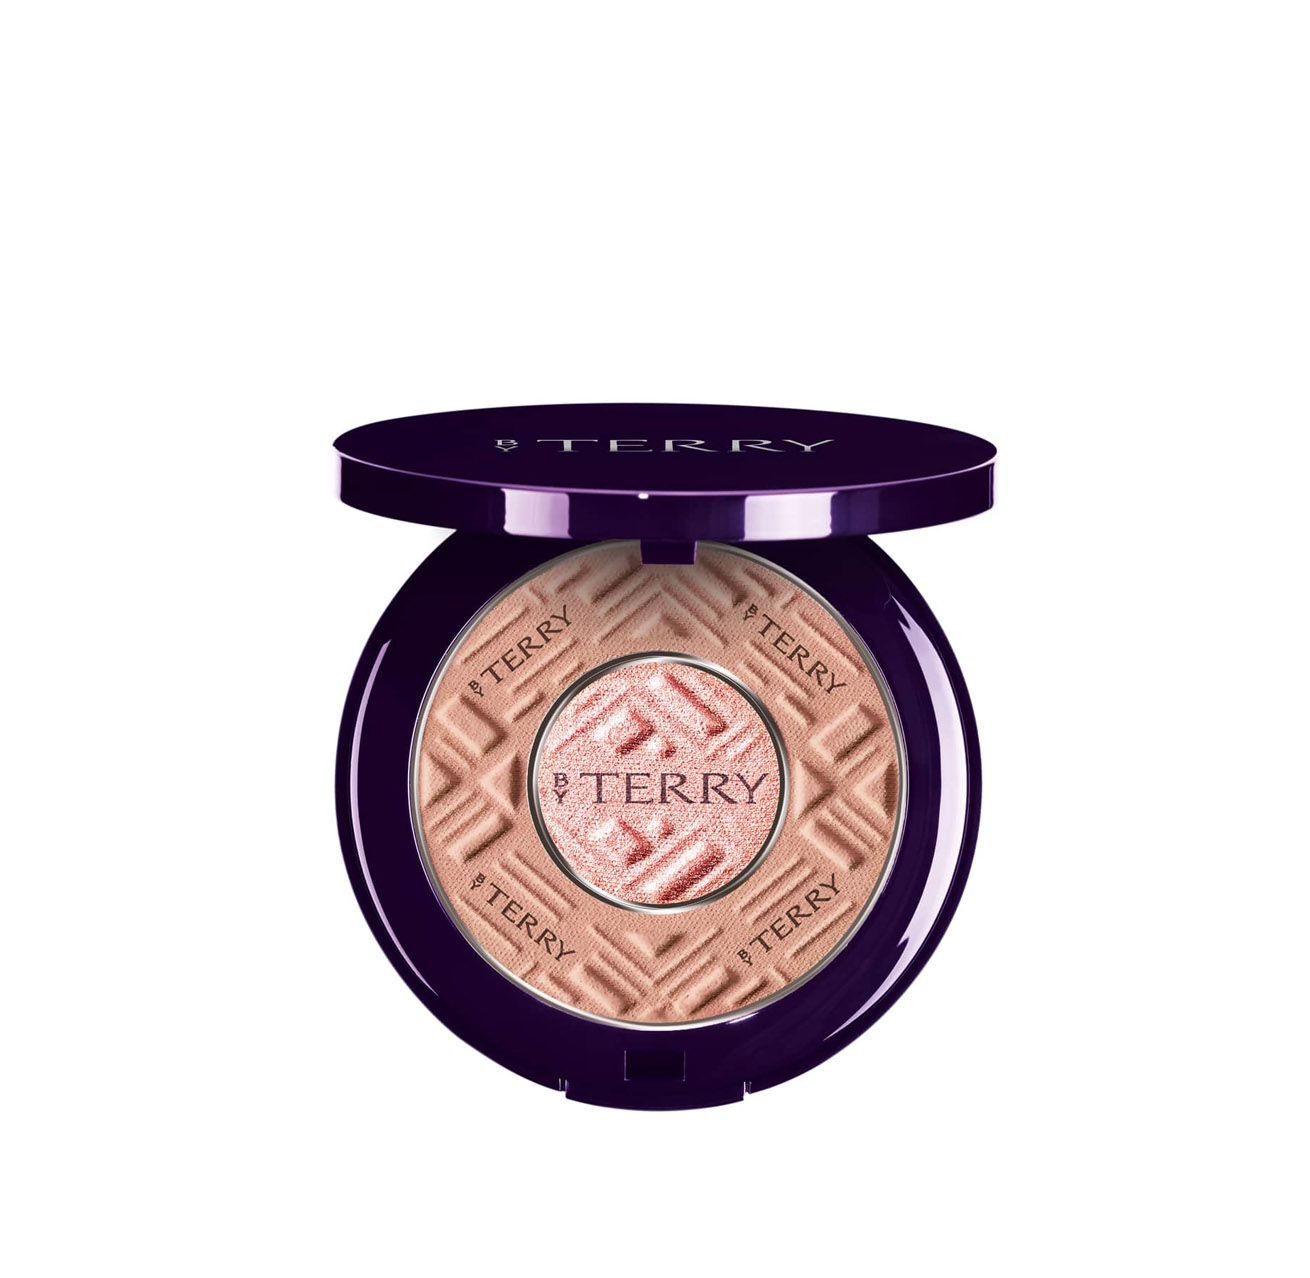 3-Compact-Expert-Dual-Powder-cipria-illuminante-opacizzante-Linea-makeup-di-lusso-By-Terry-Dispar-SpA.jpg